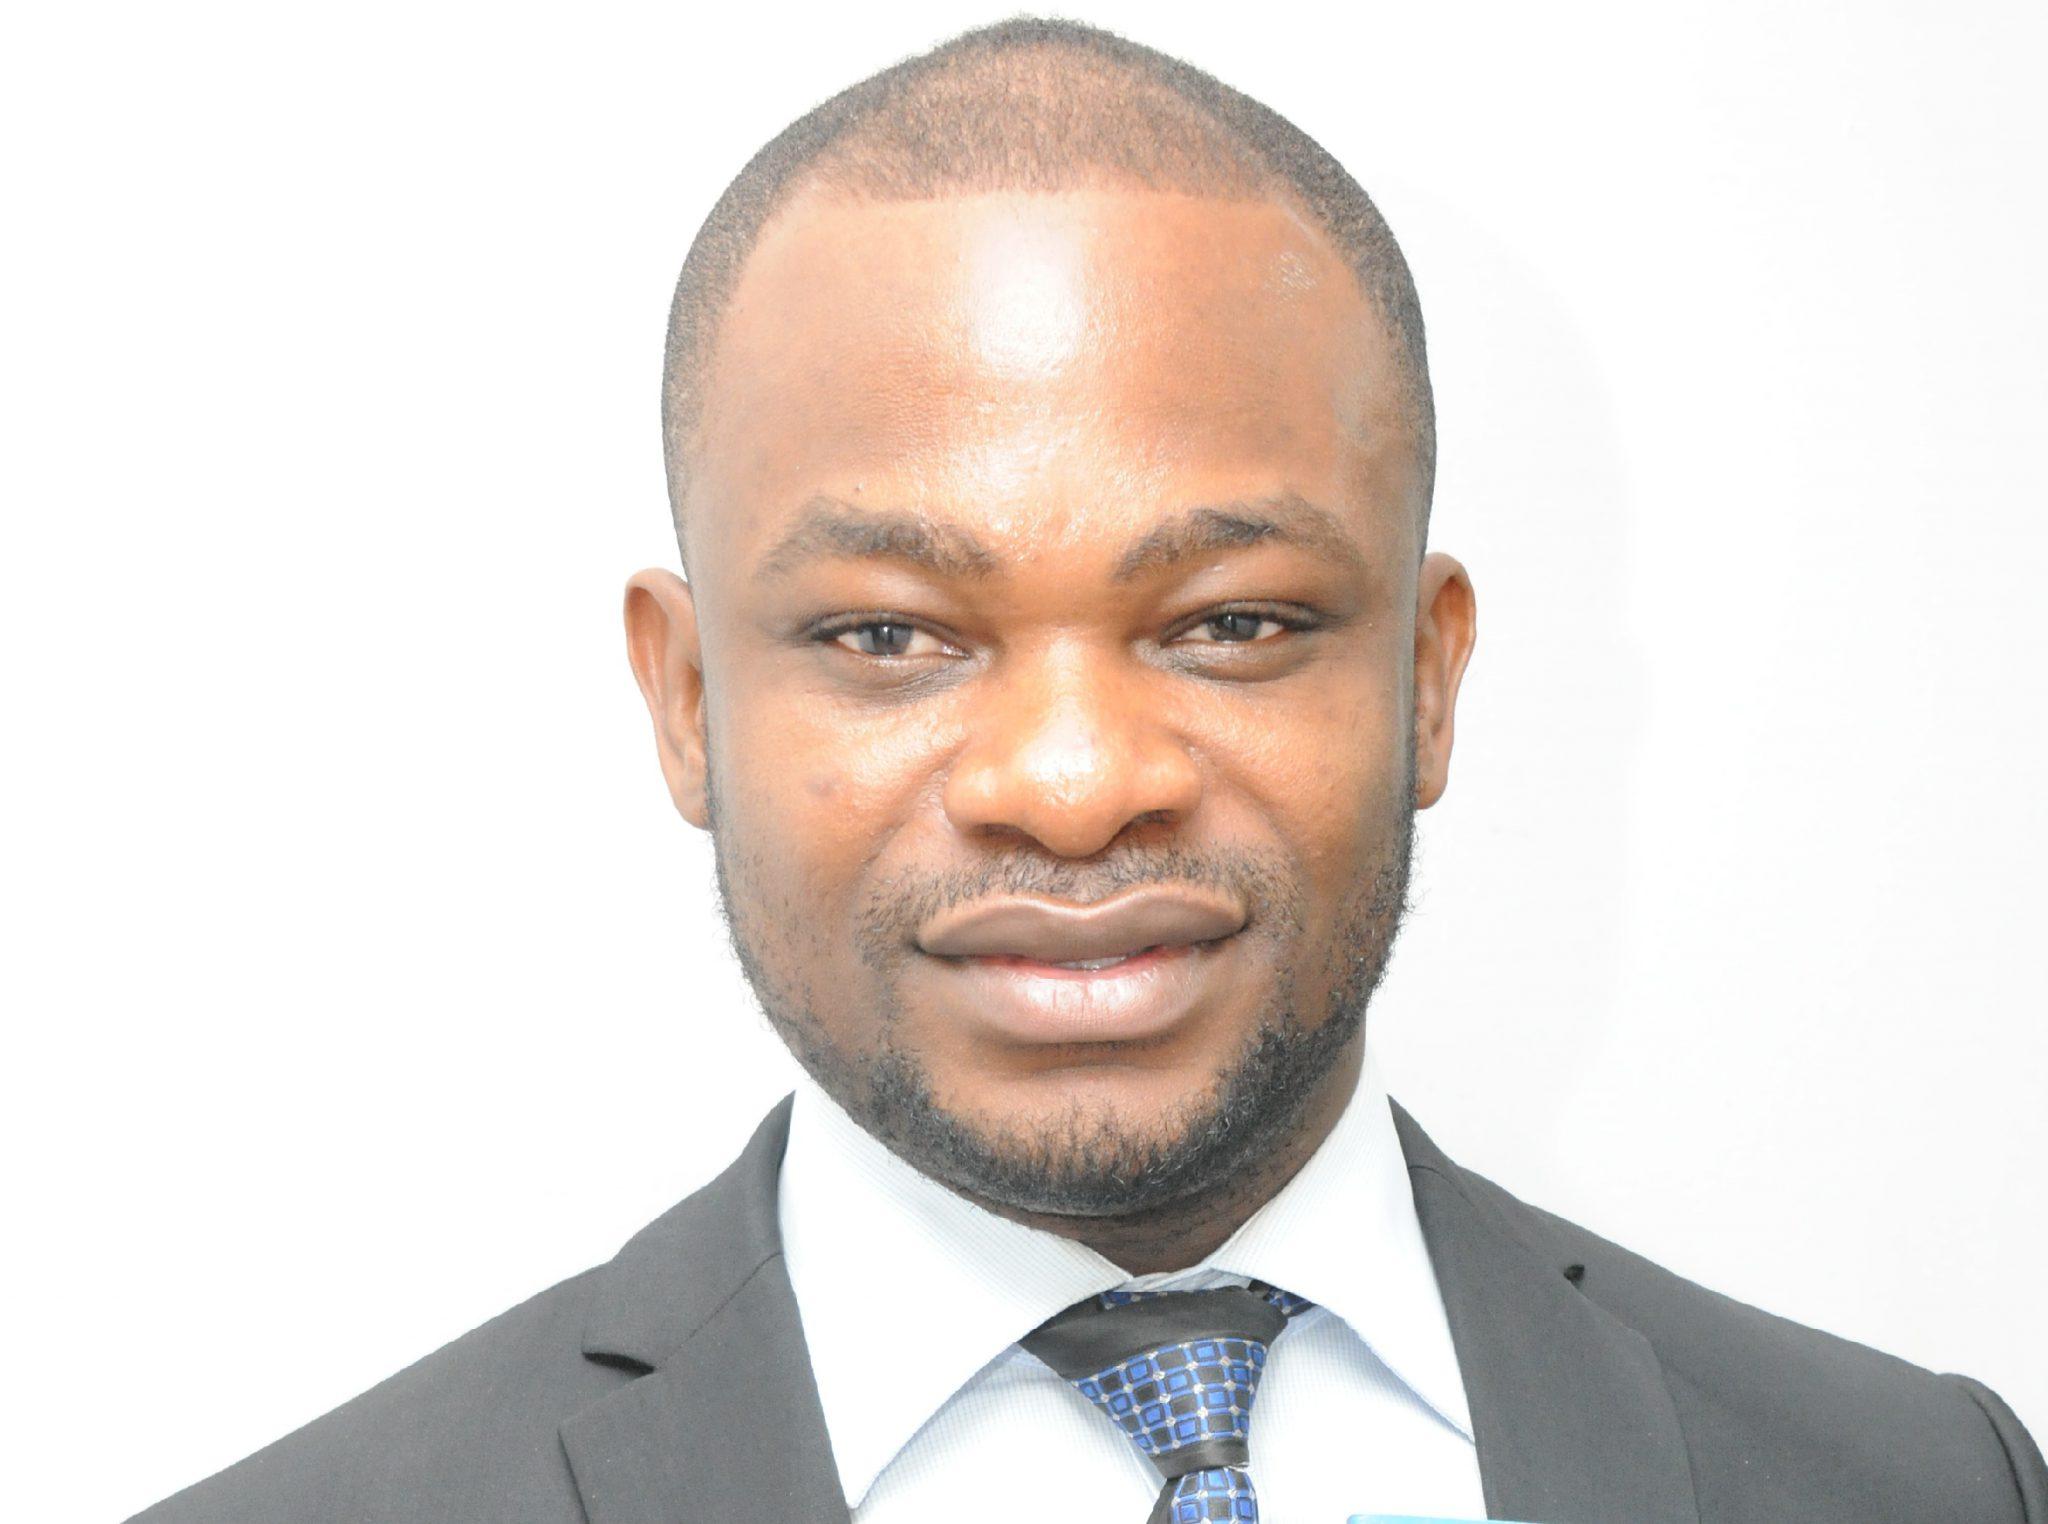 OPINION: Nigeria Has Come, By Kelechi Okoronkwo